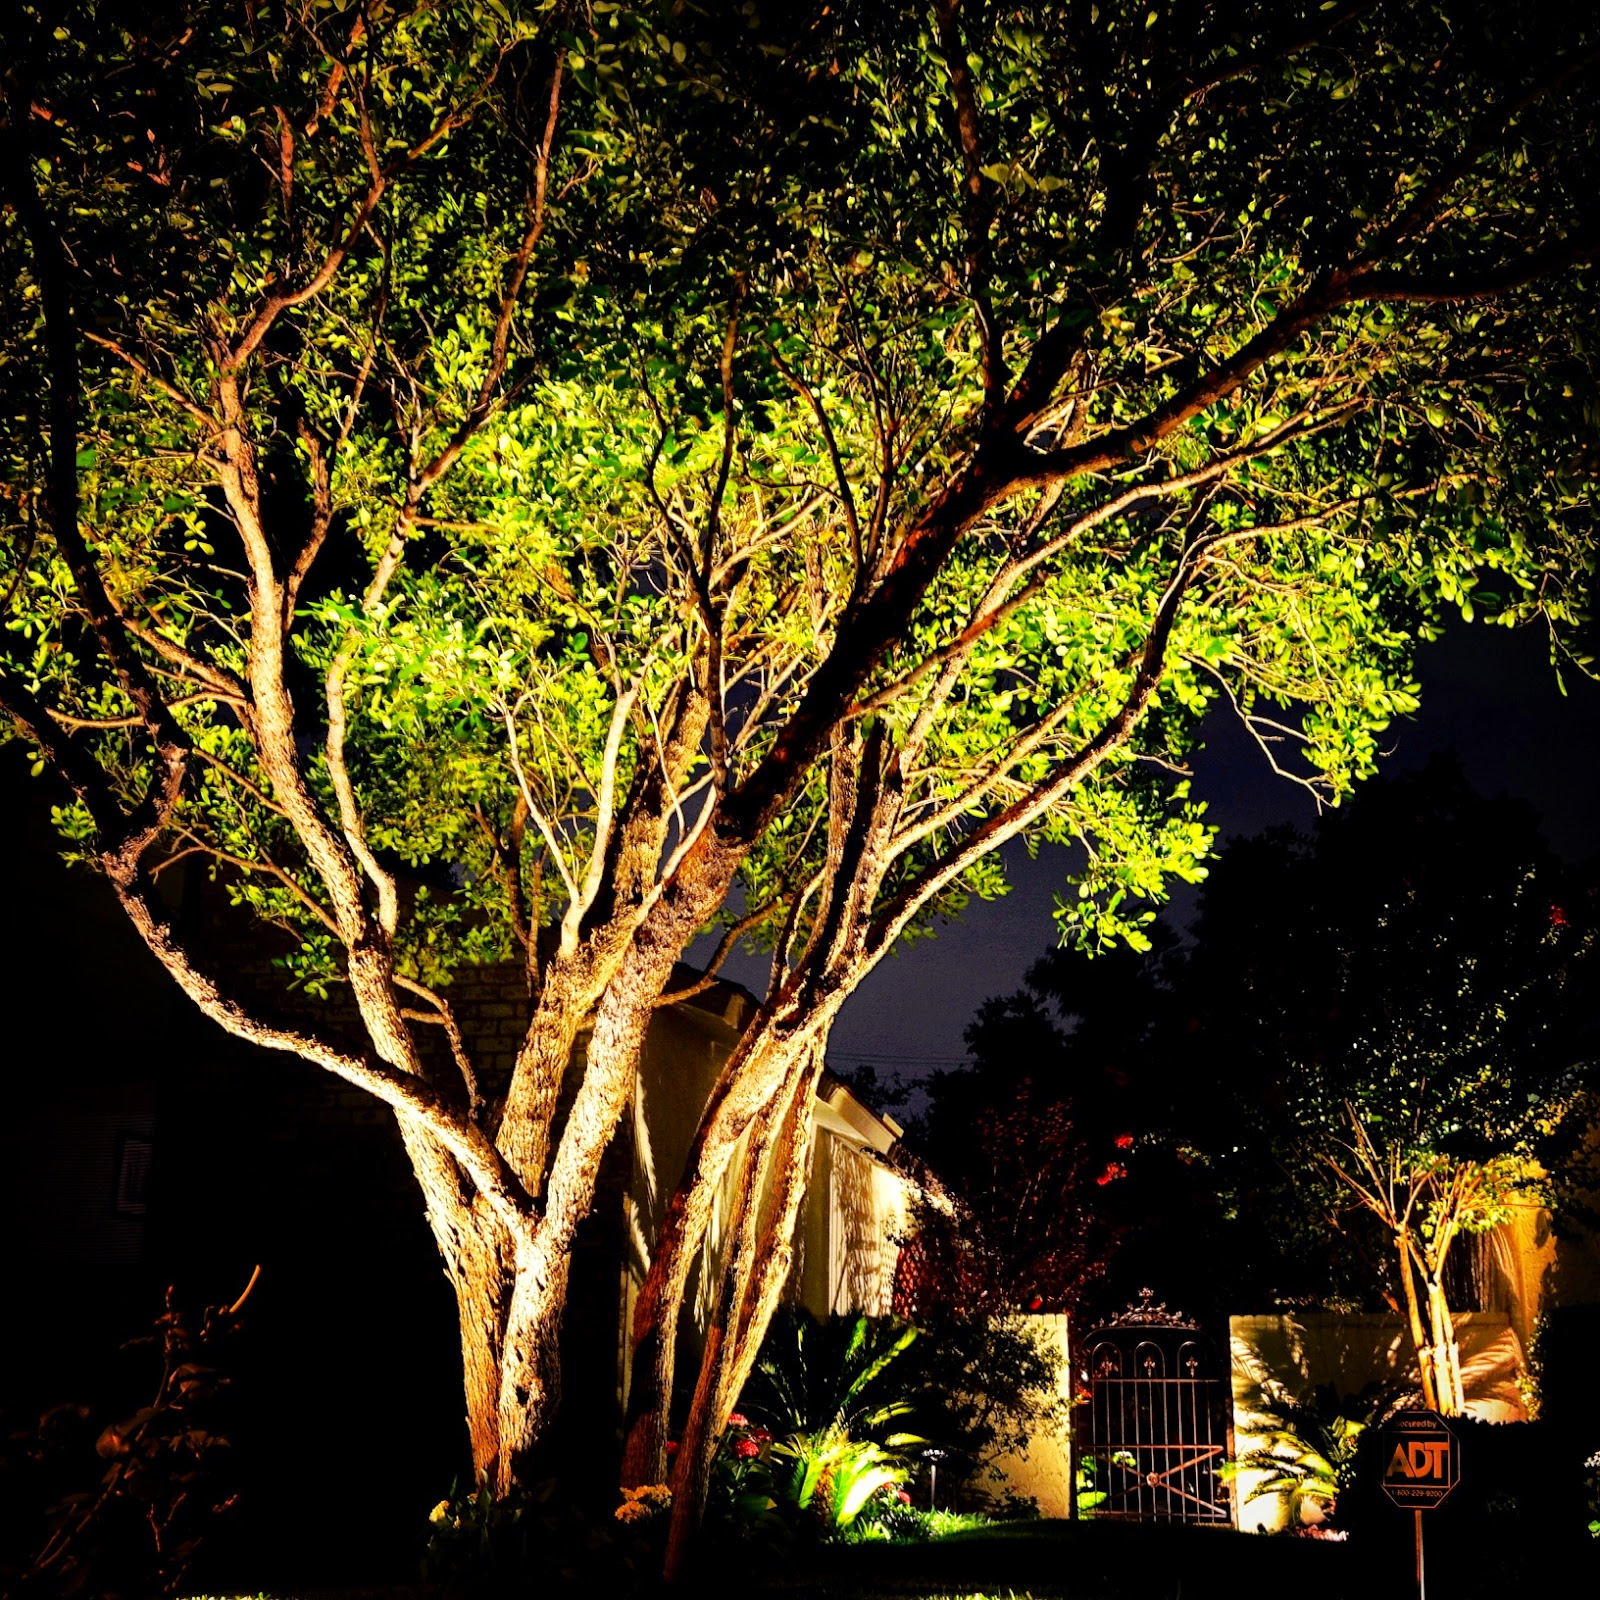 Preferred landscape and lighting san antonio 28 images preferred preferred aloadofball Images